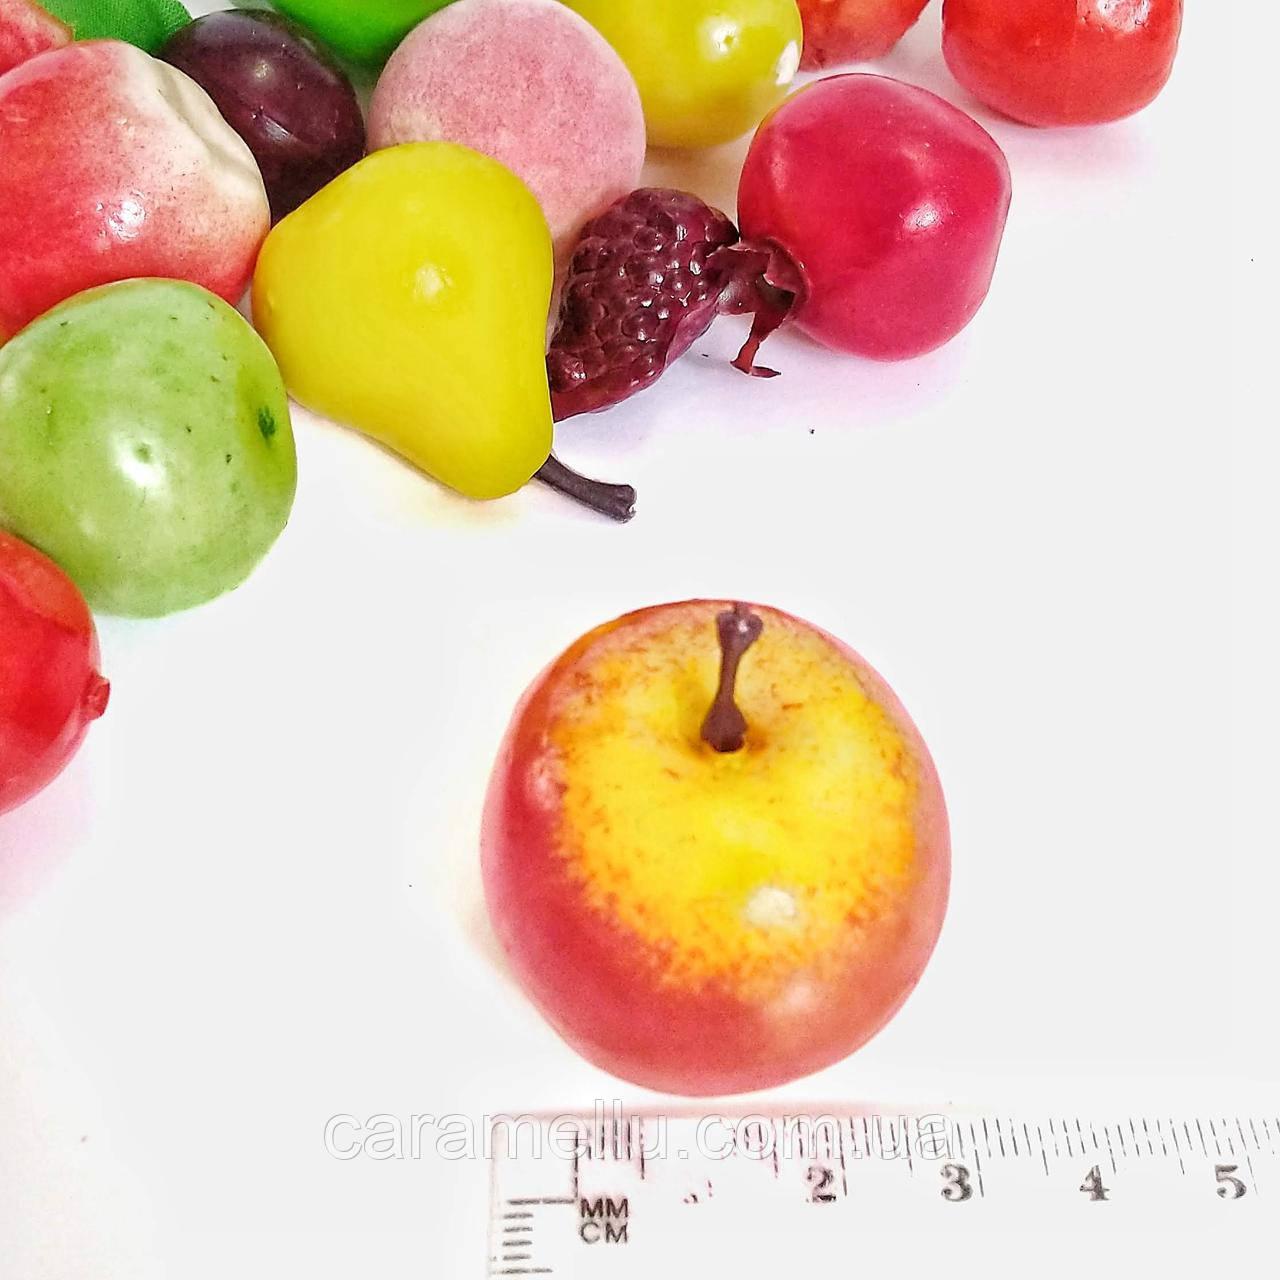 Яблоко желто-красное мини. 3 см.